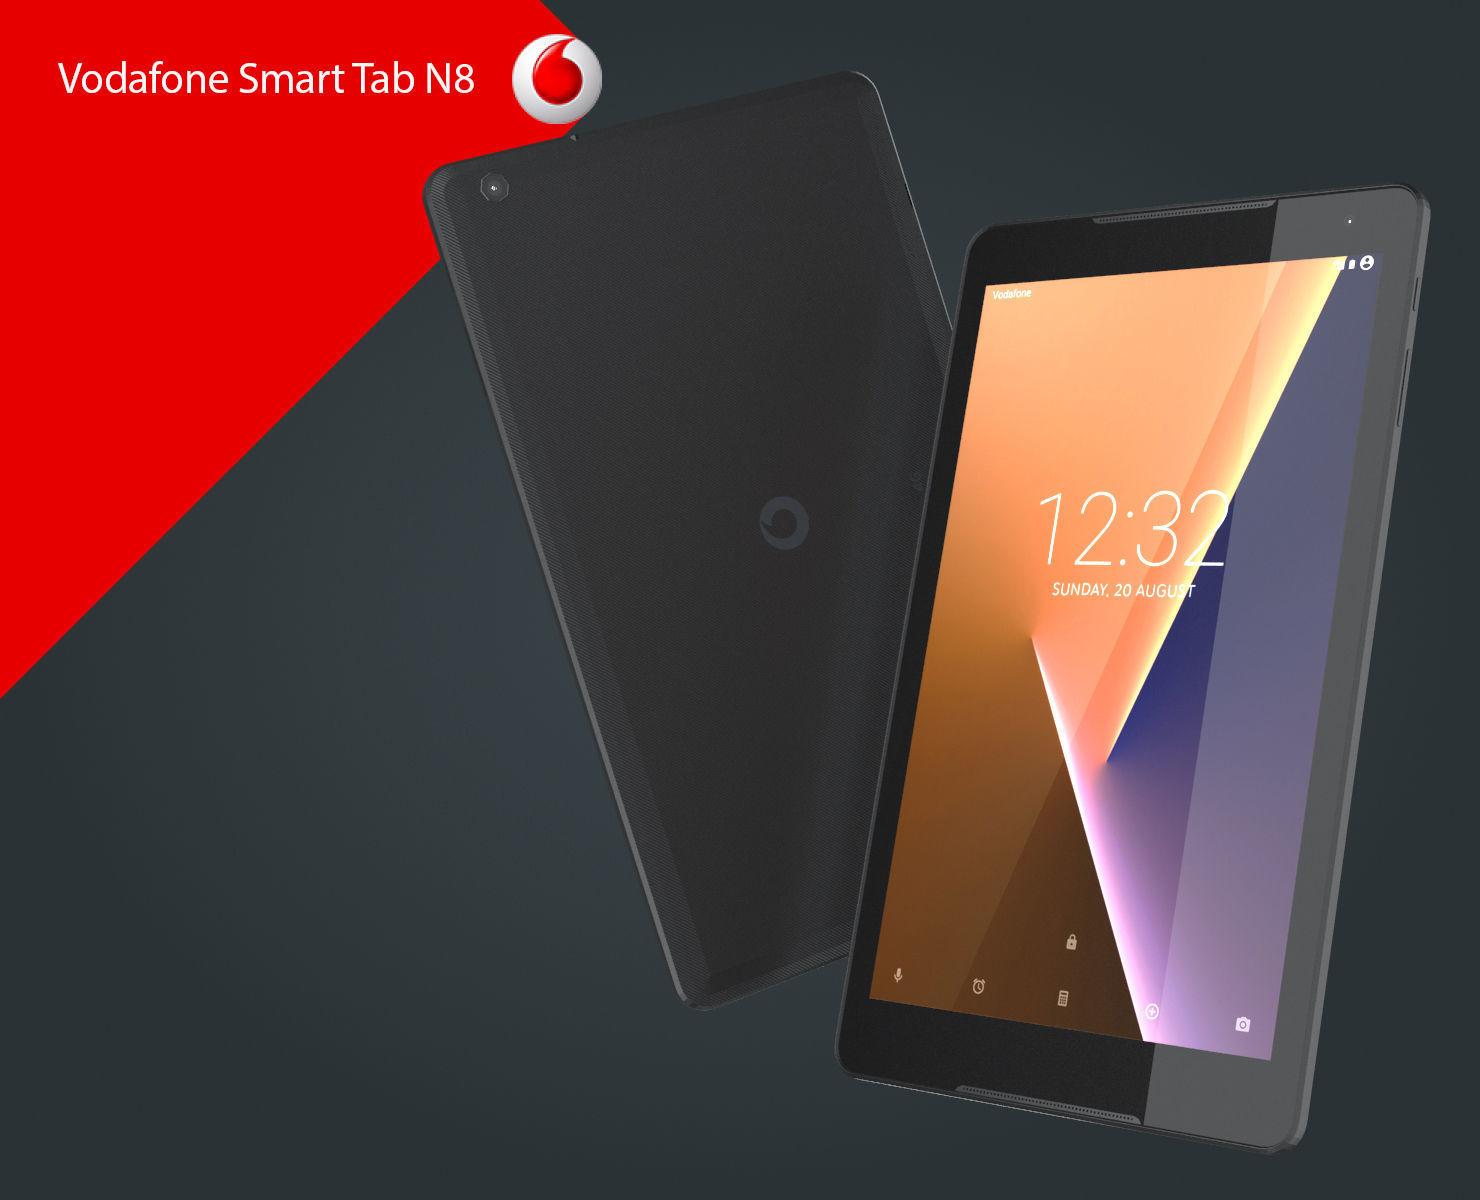 مواصفات Vodafone Smart Tab N8